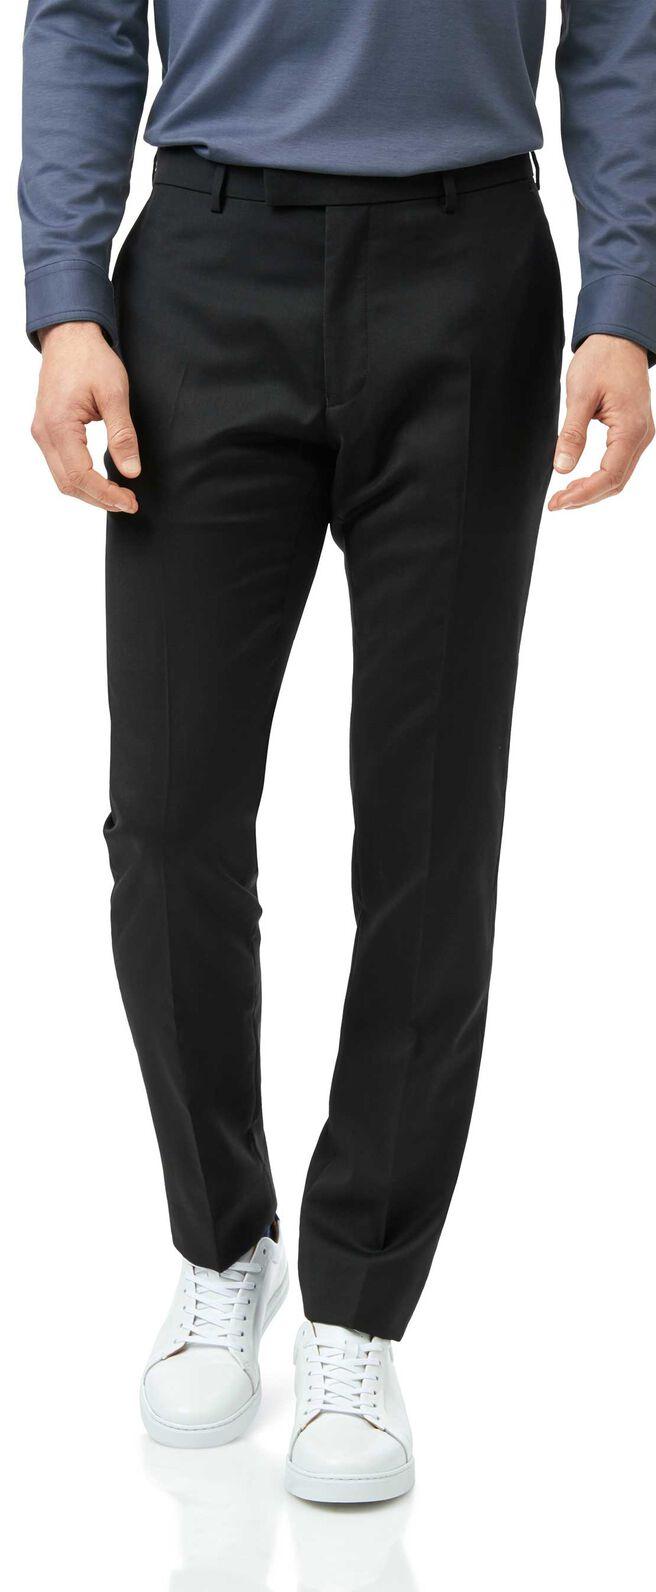 Black slim fit Italian natural stretch suit